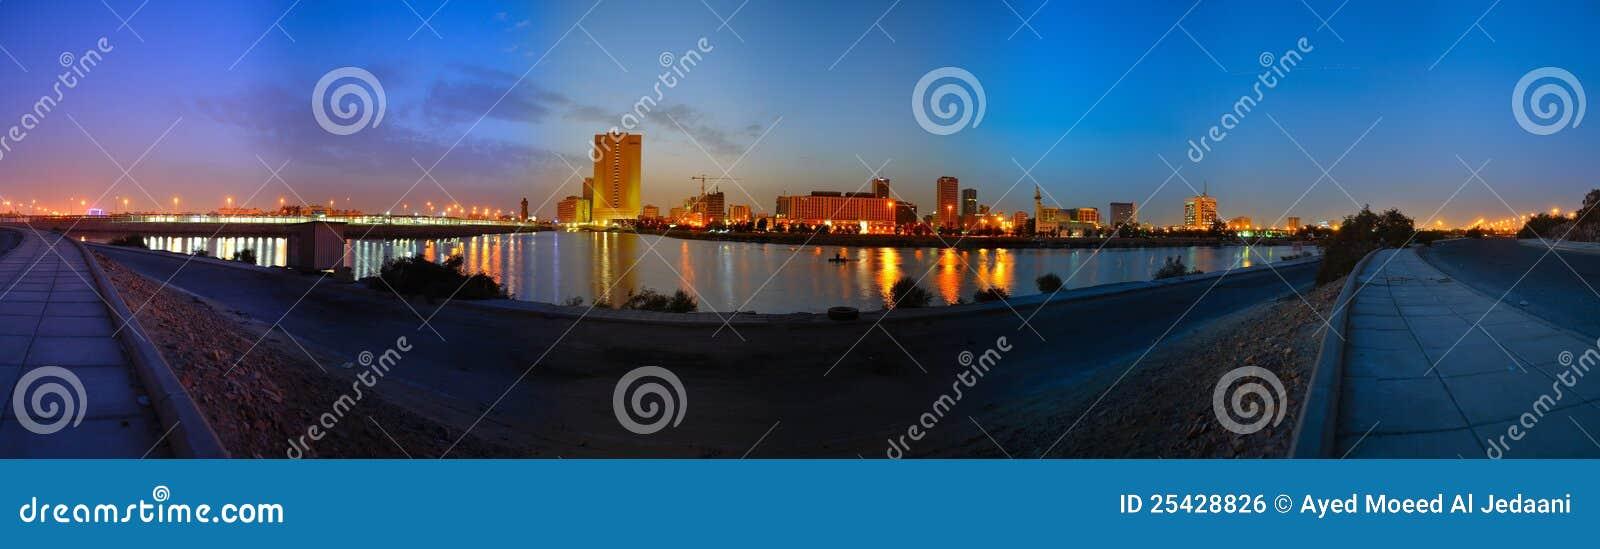 Jeddah downtown at dawn